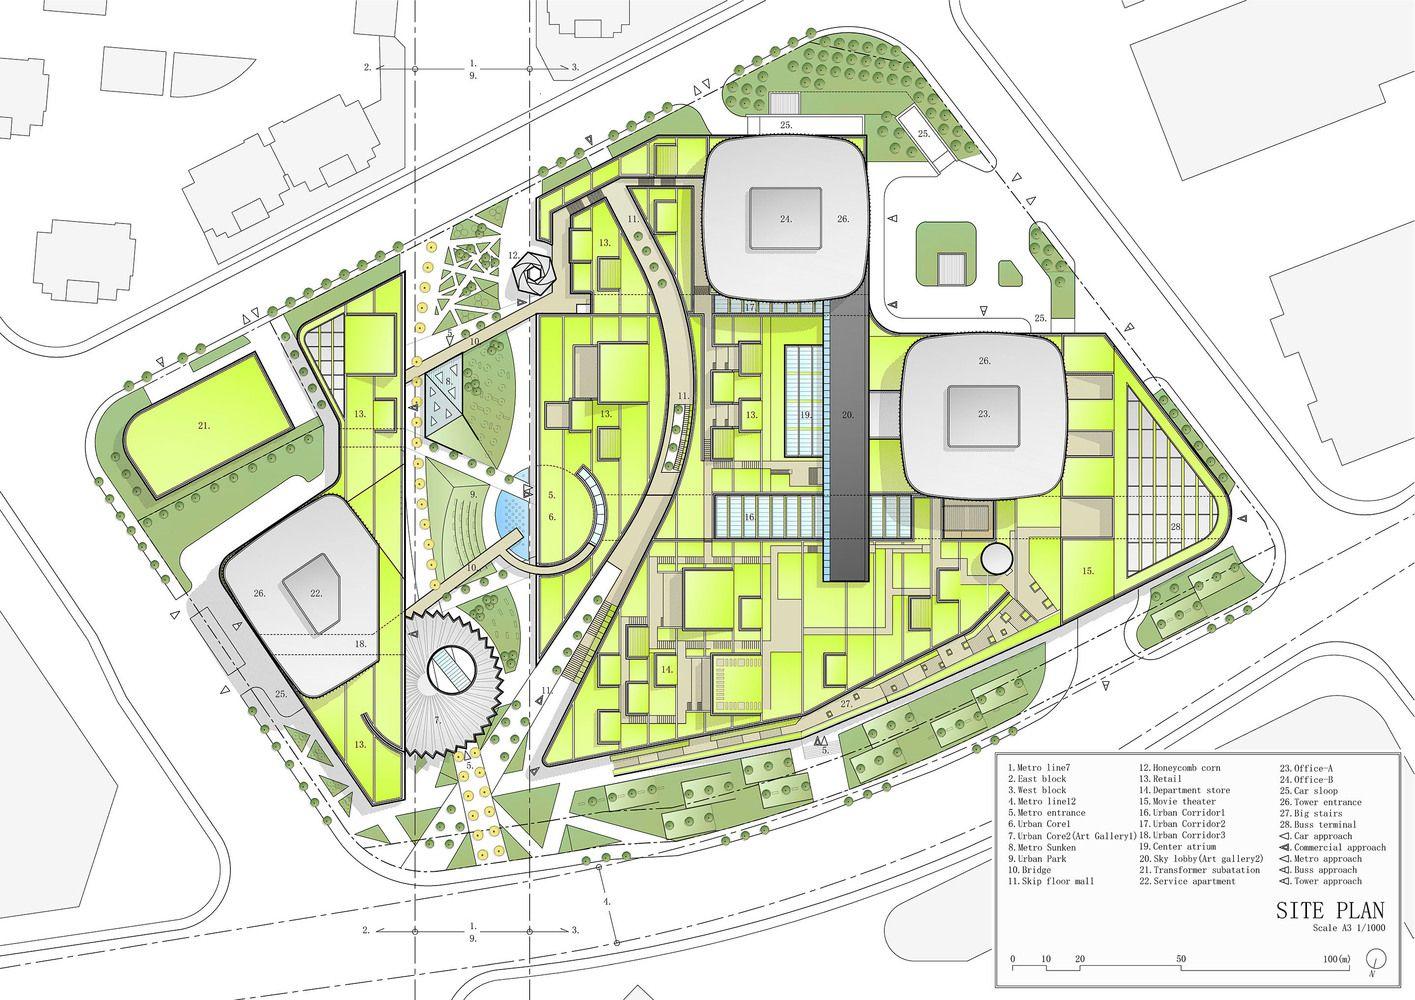 Gallery Of Shanghai Greenland Center Nikken Sekkei 27 Site Plan Mall Design Urban Design Plan